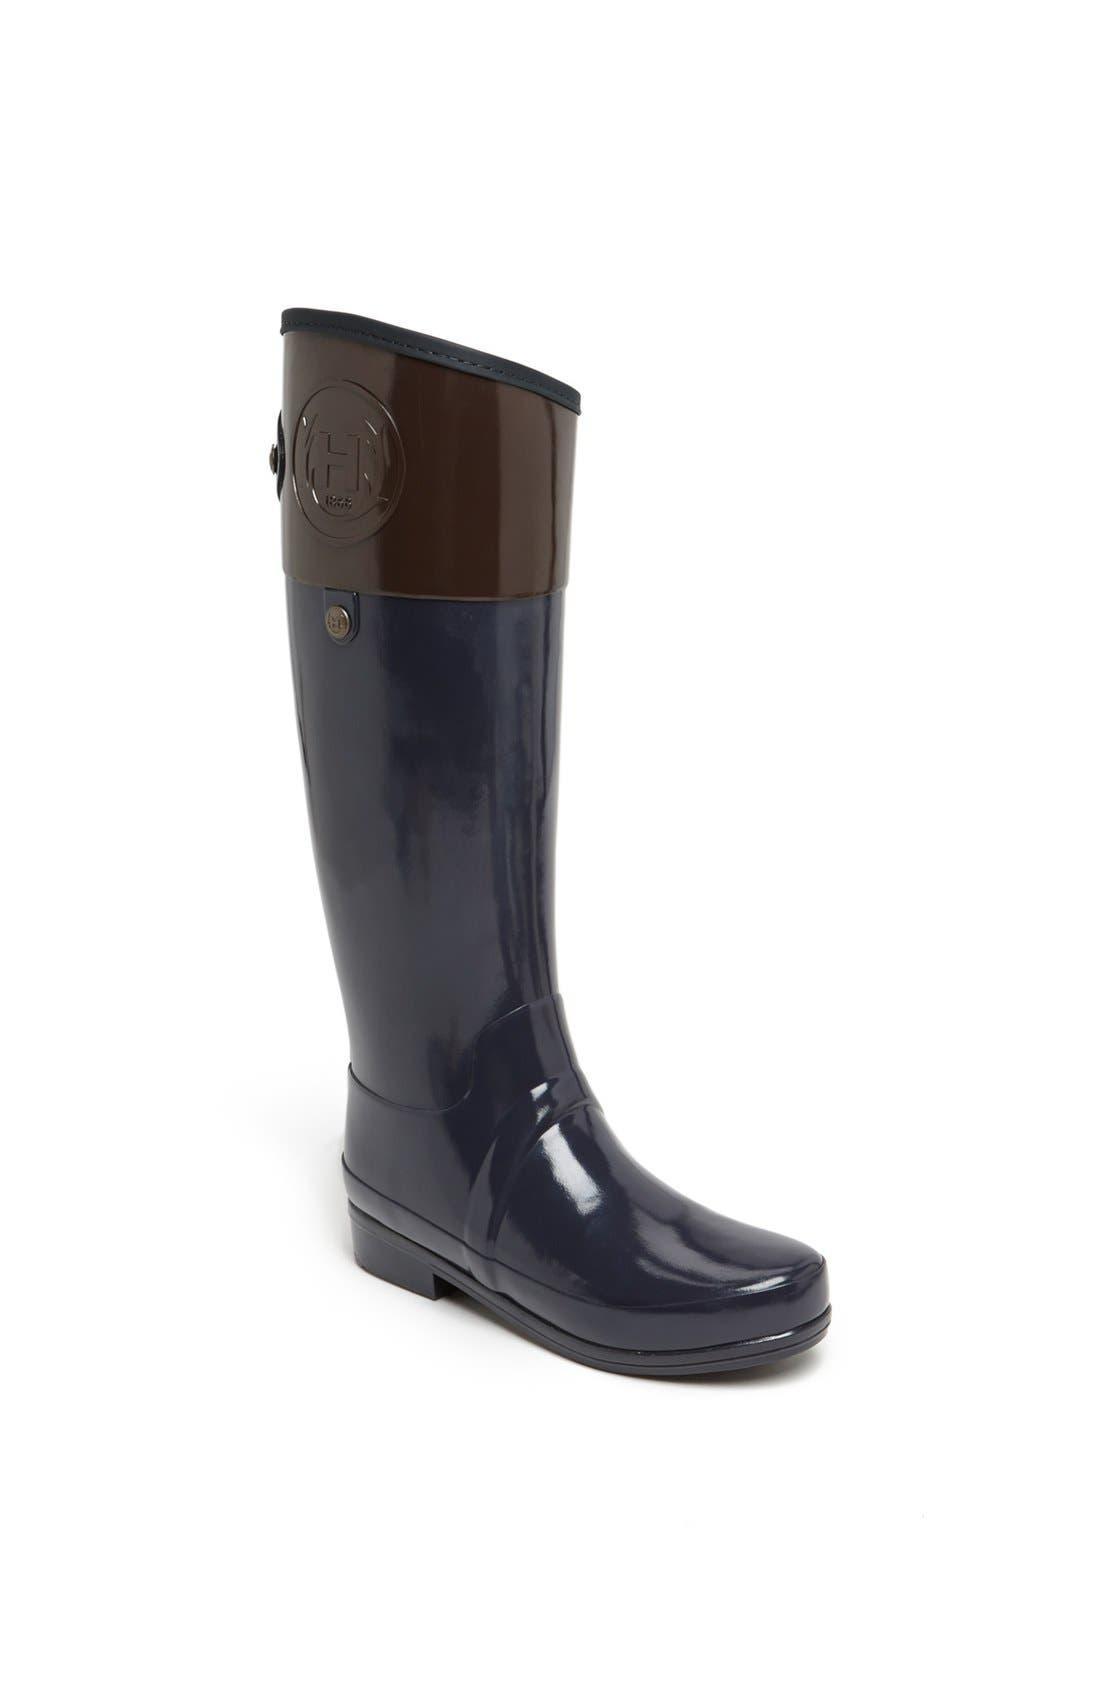 Main Image - Hunter 'Sandhurst Carlyle' Tall Riding Rain Boot (Women)